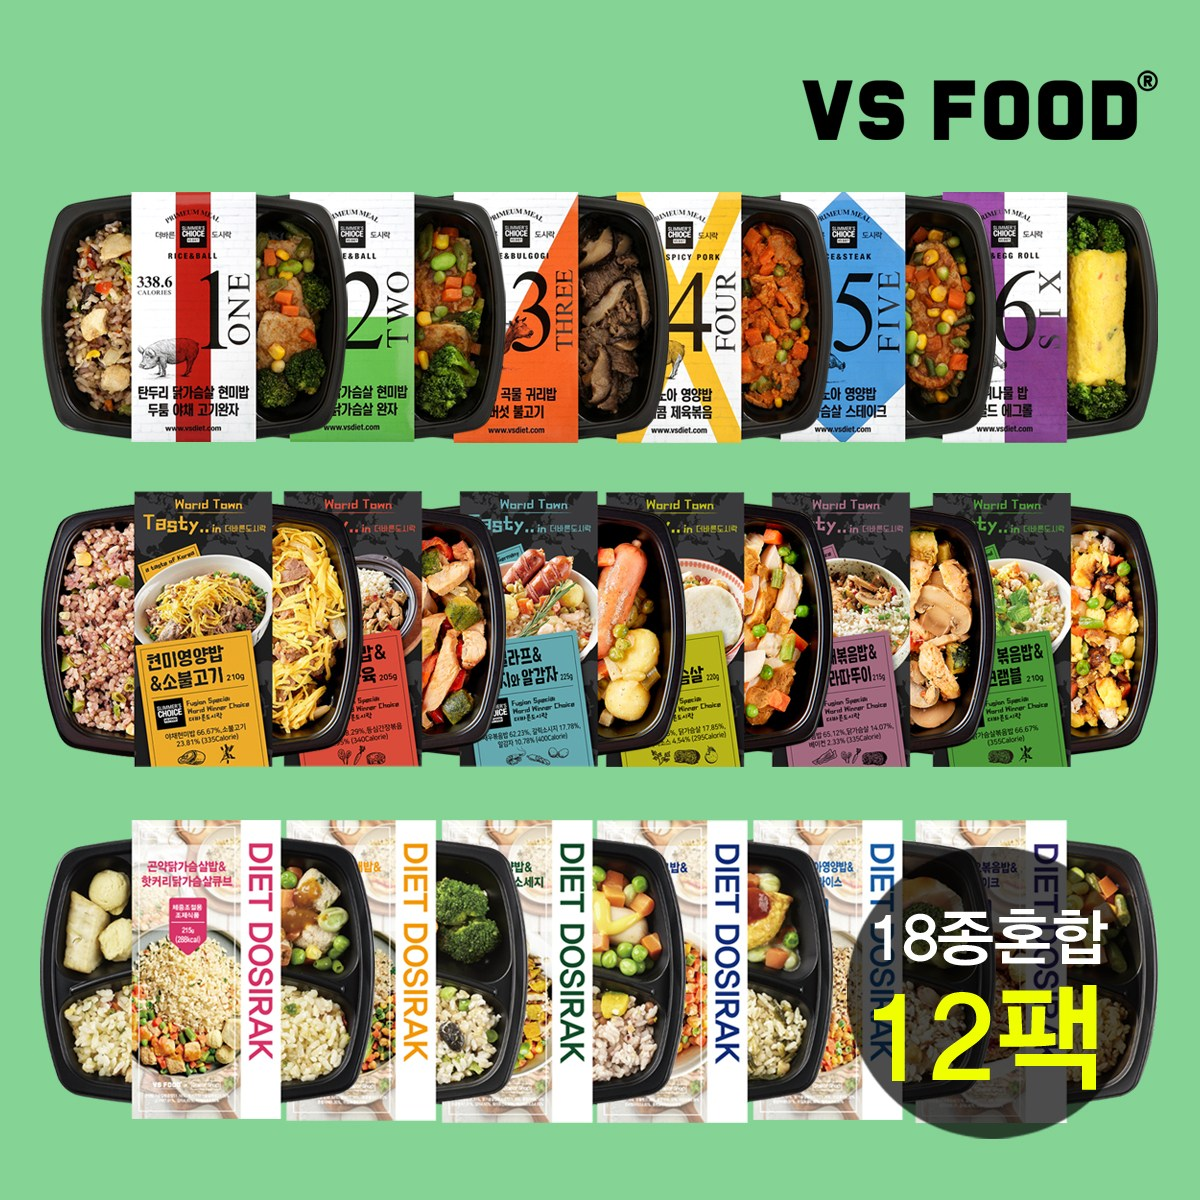 VSFood 다이어트 도시락 외 18종 [1일2식 12팩] 월드타운6팩+다이어트6팩, 12개입